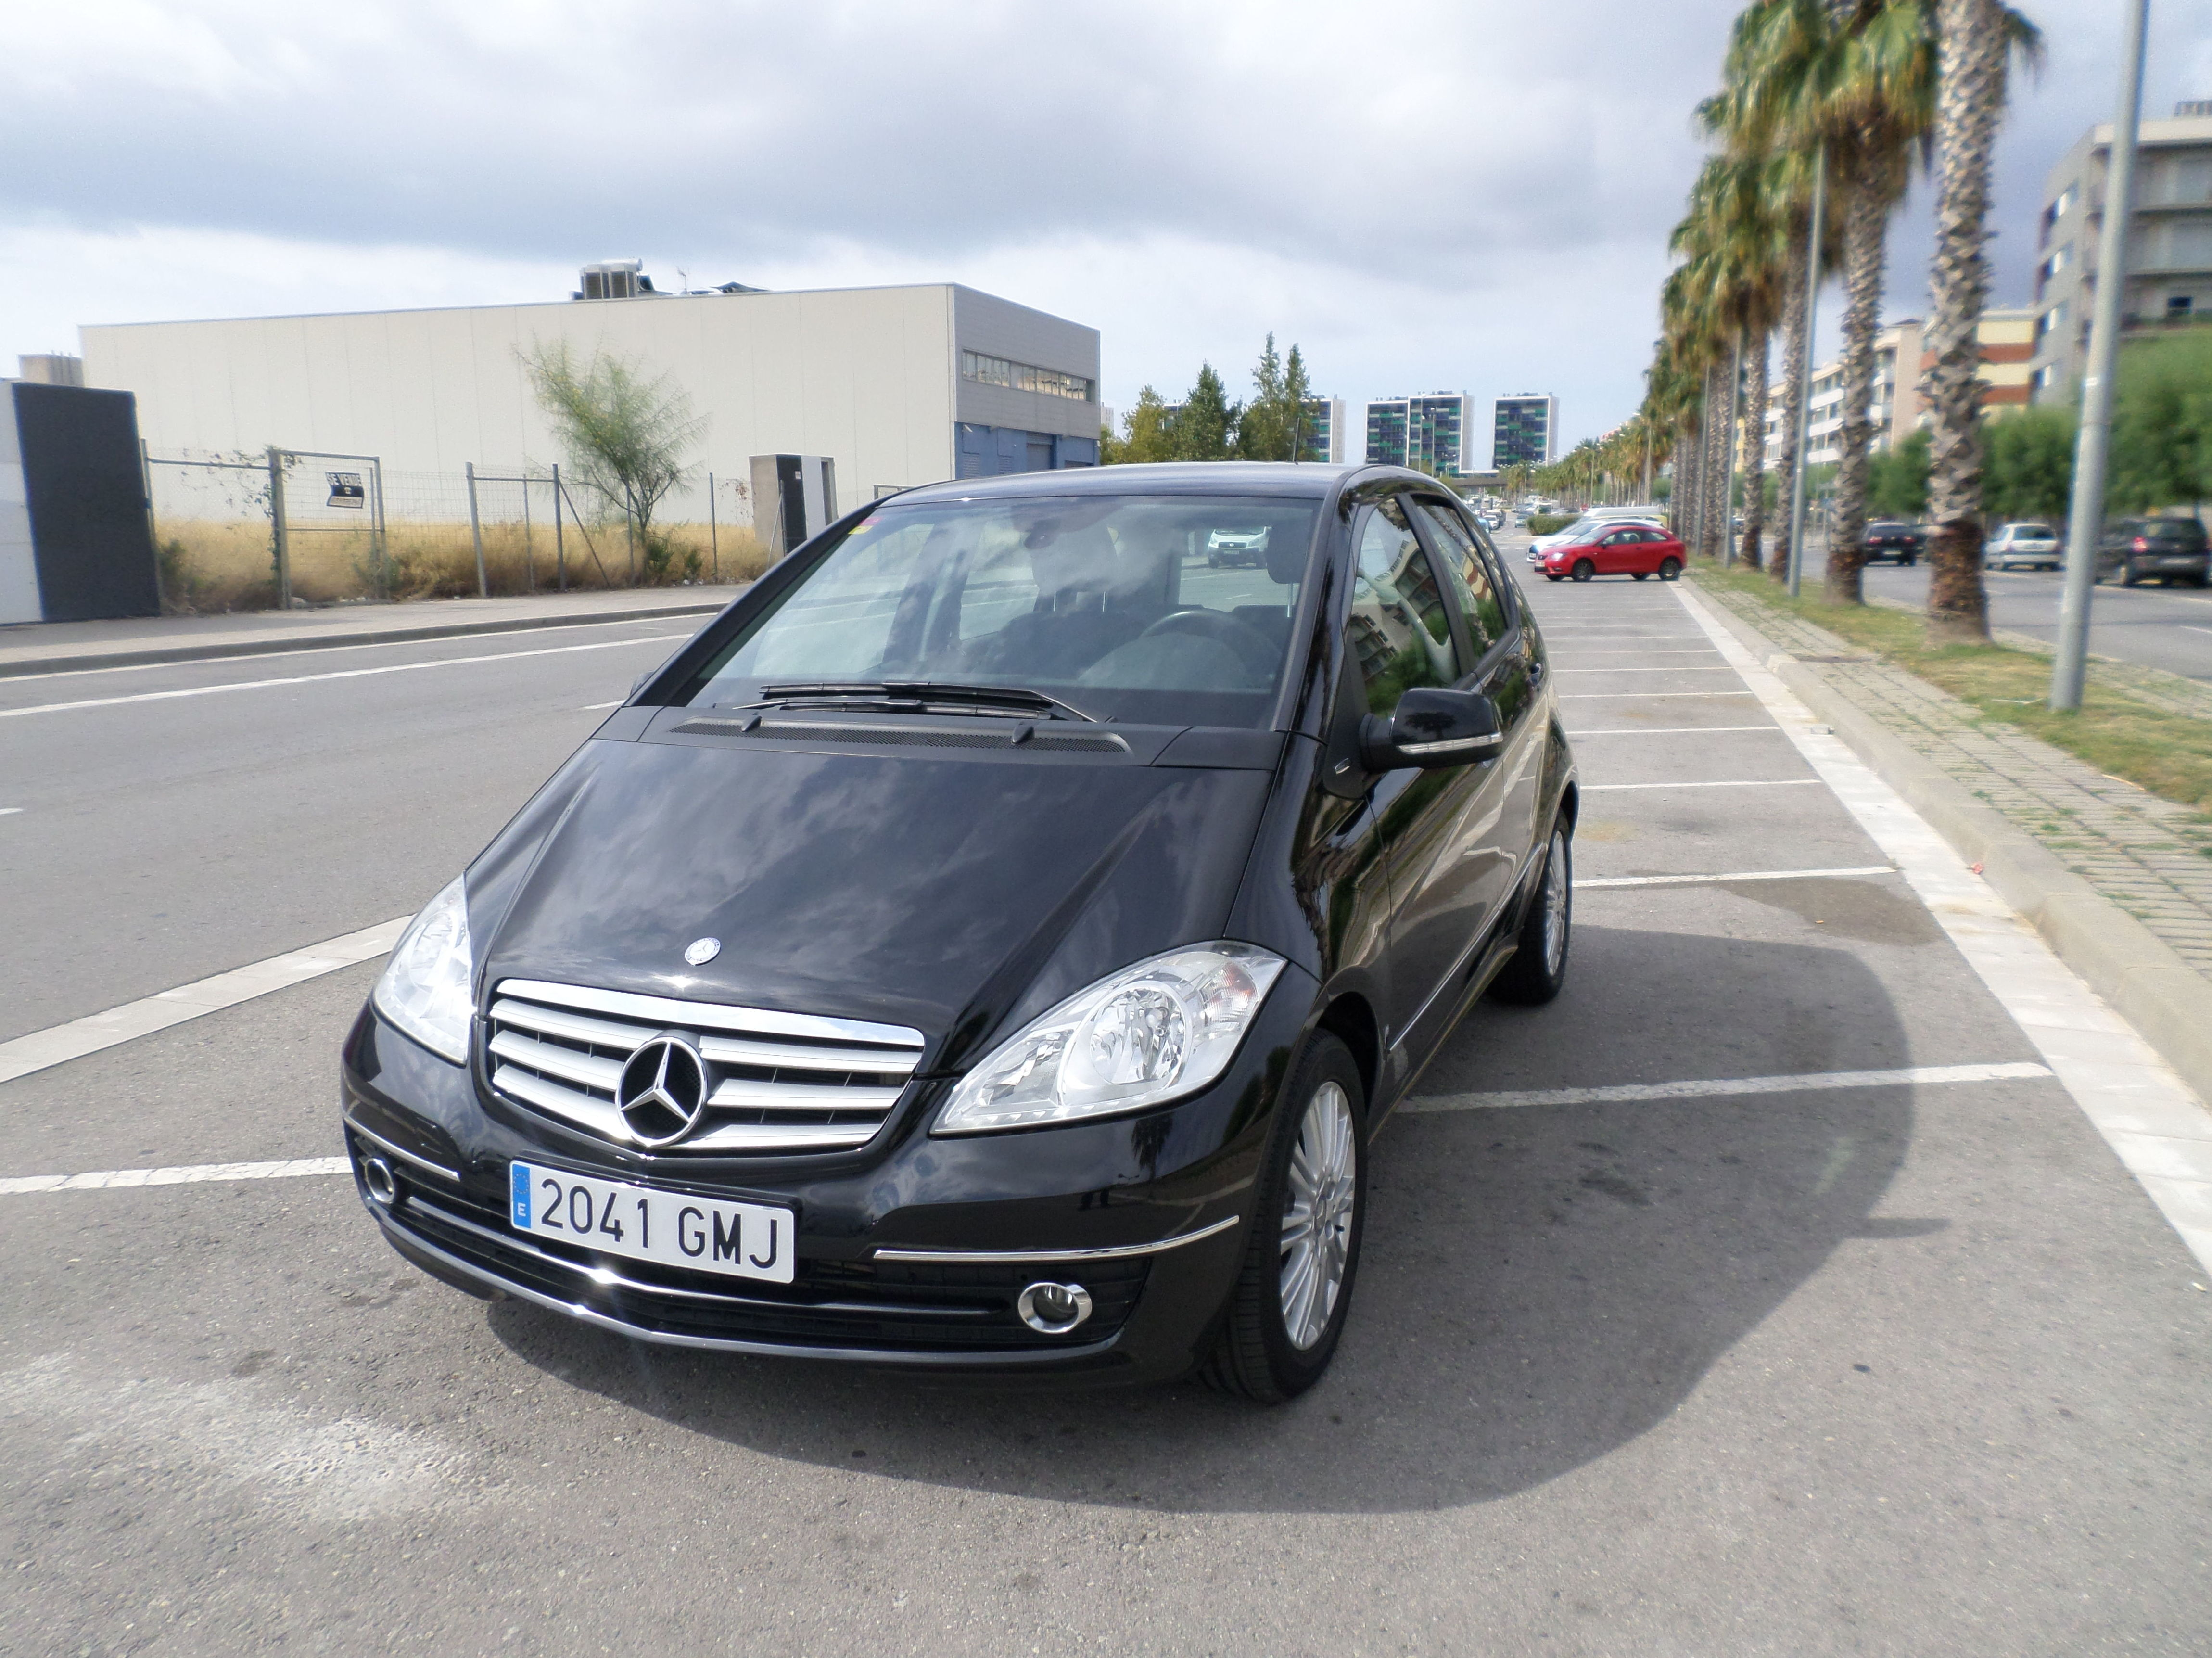 Mercedes Benz Clase A A 180 CDI elegance 5 p  pvp 8500 €uros: Servicios de reparación  de Automóviles y Talleres Dorado